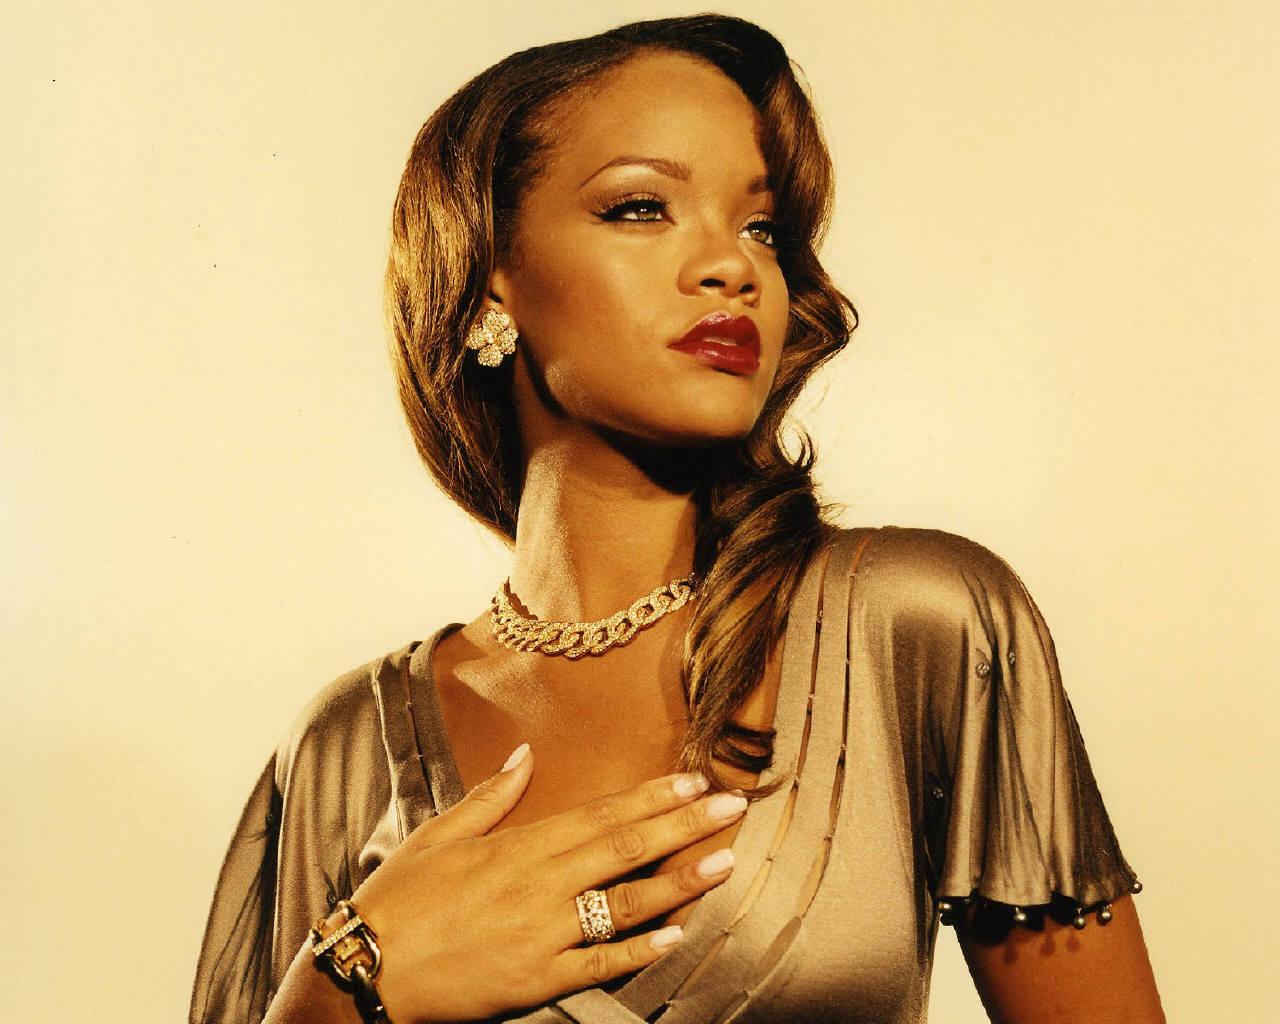 Rihanna - Rihanna Wallpaper (166370) - Fanpop Rihanna